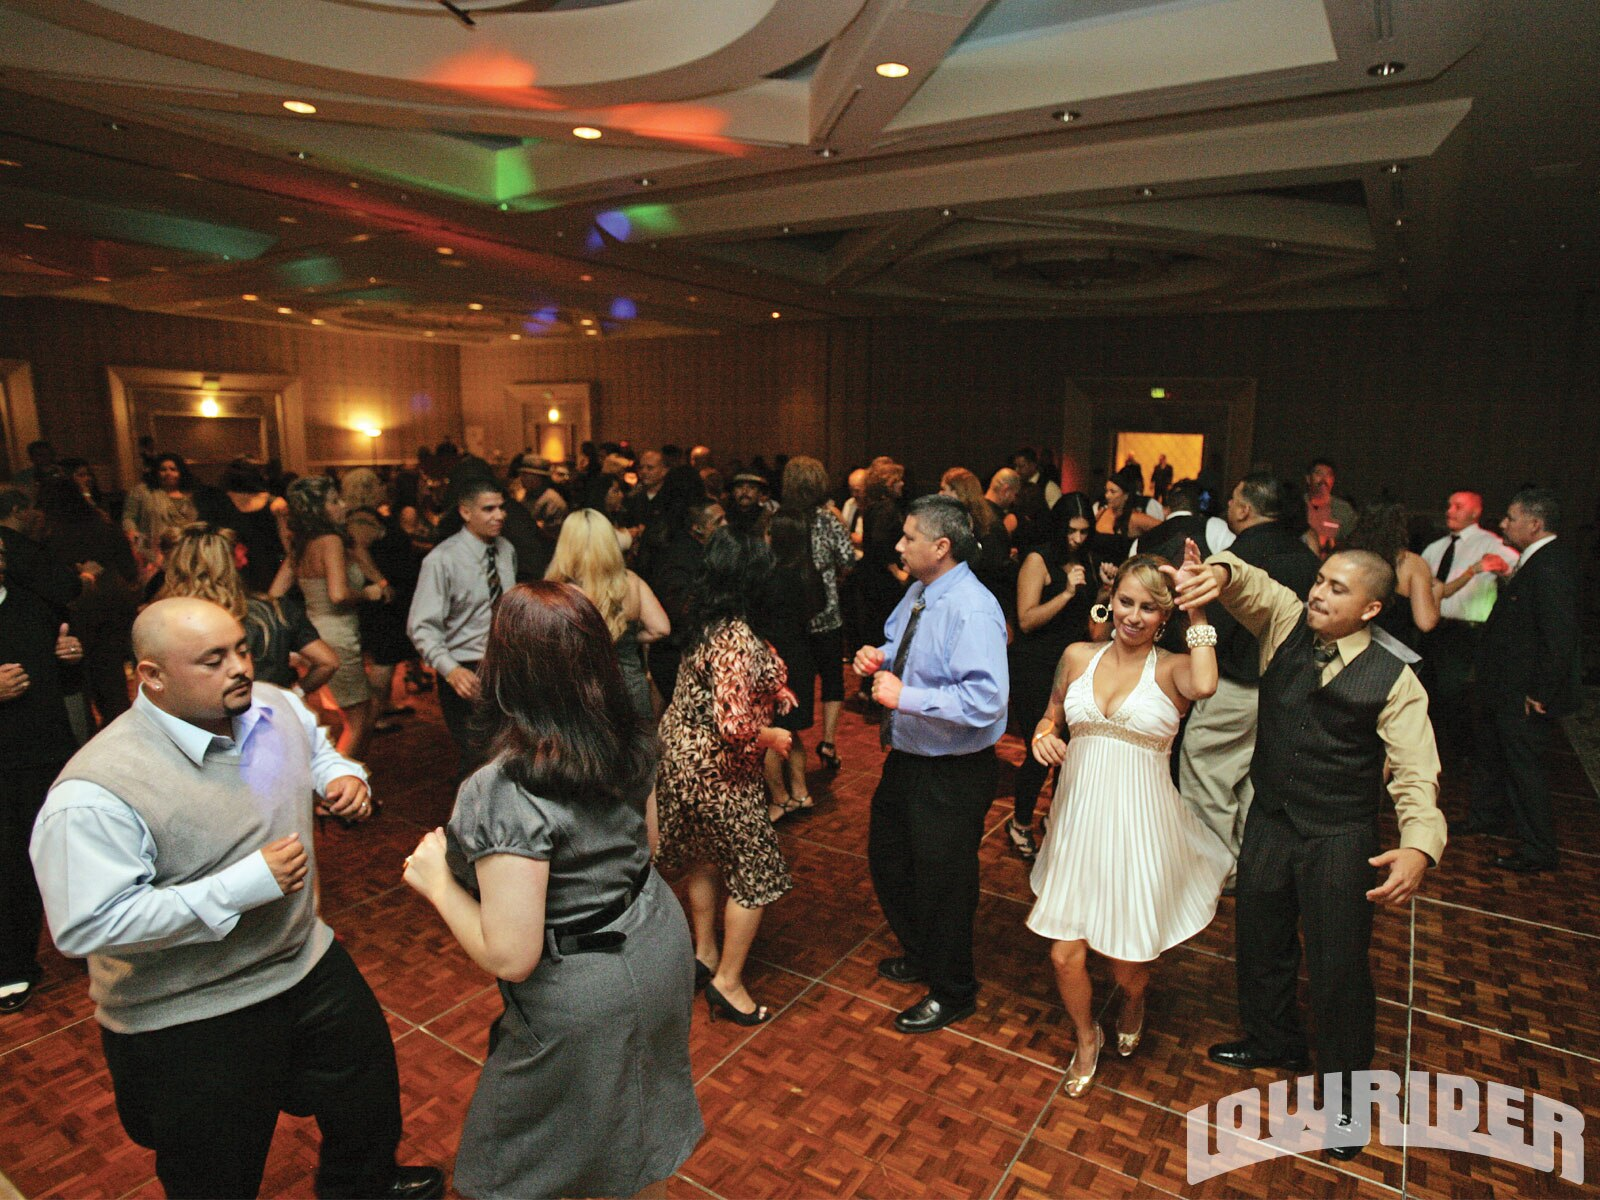 1102_lrmp_01_o-2010_lowrider_hall_of_fame_banquet-dancefloor2